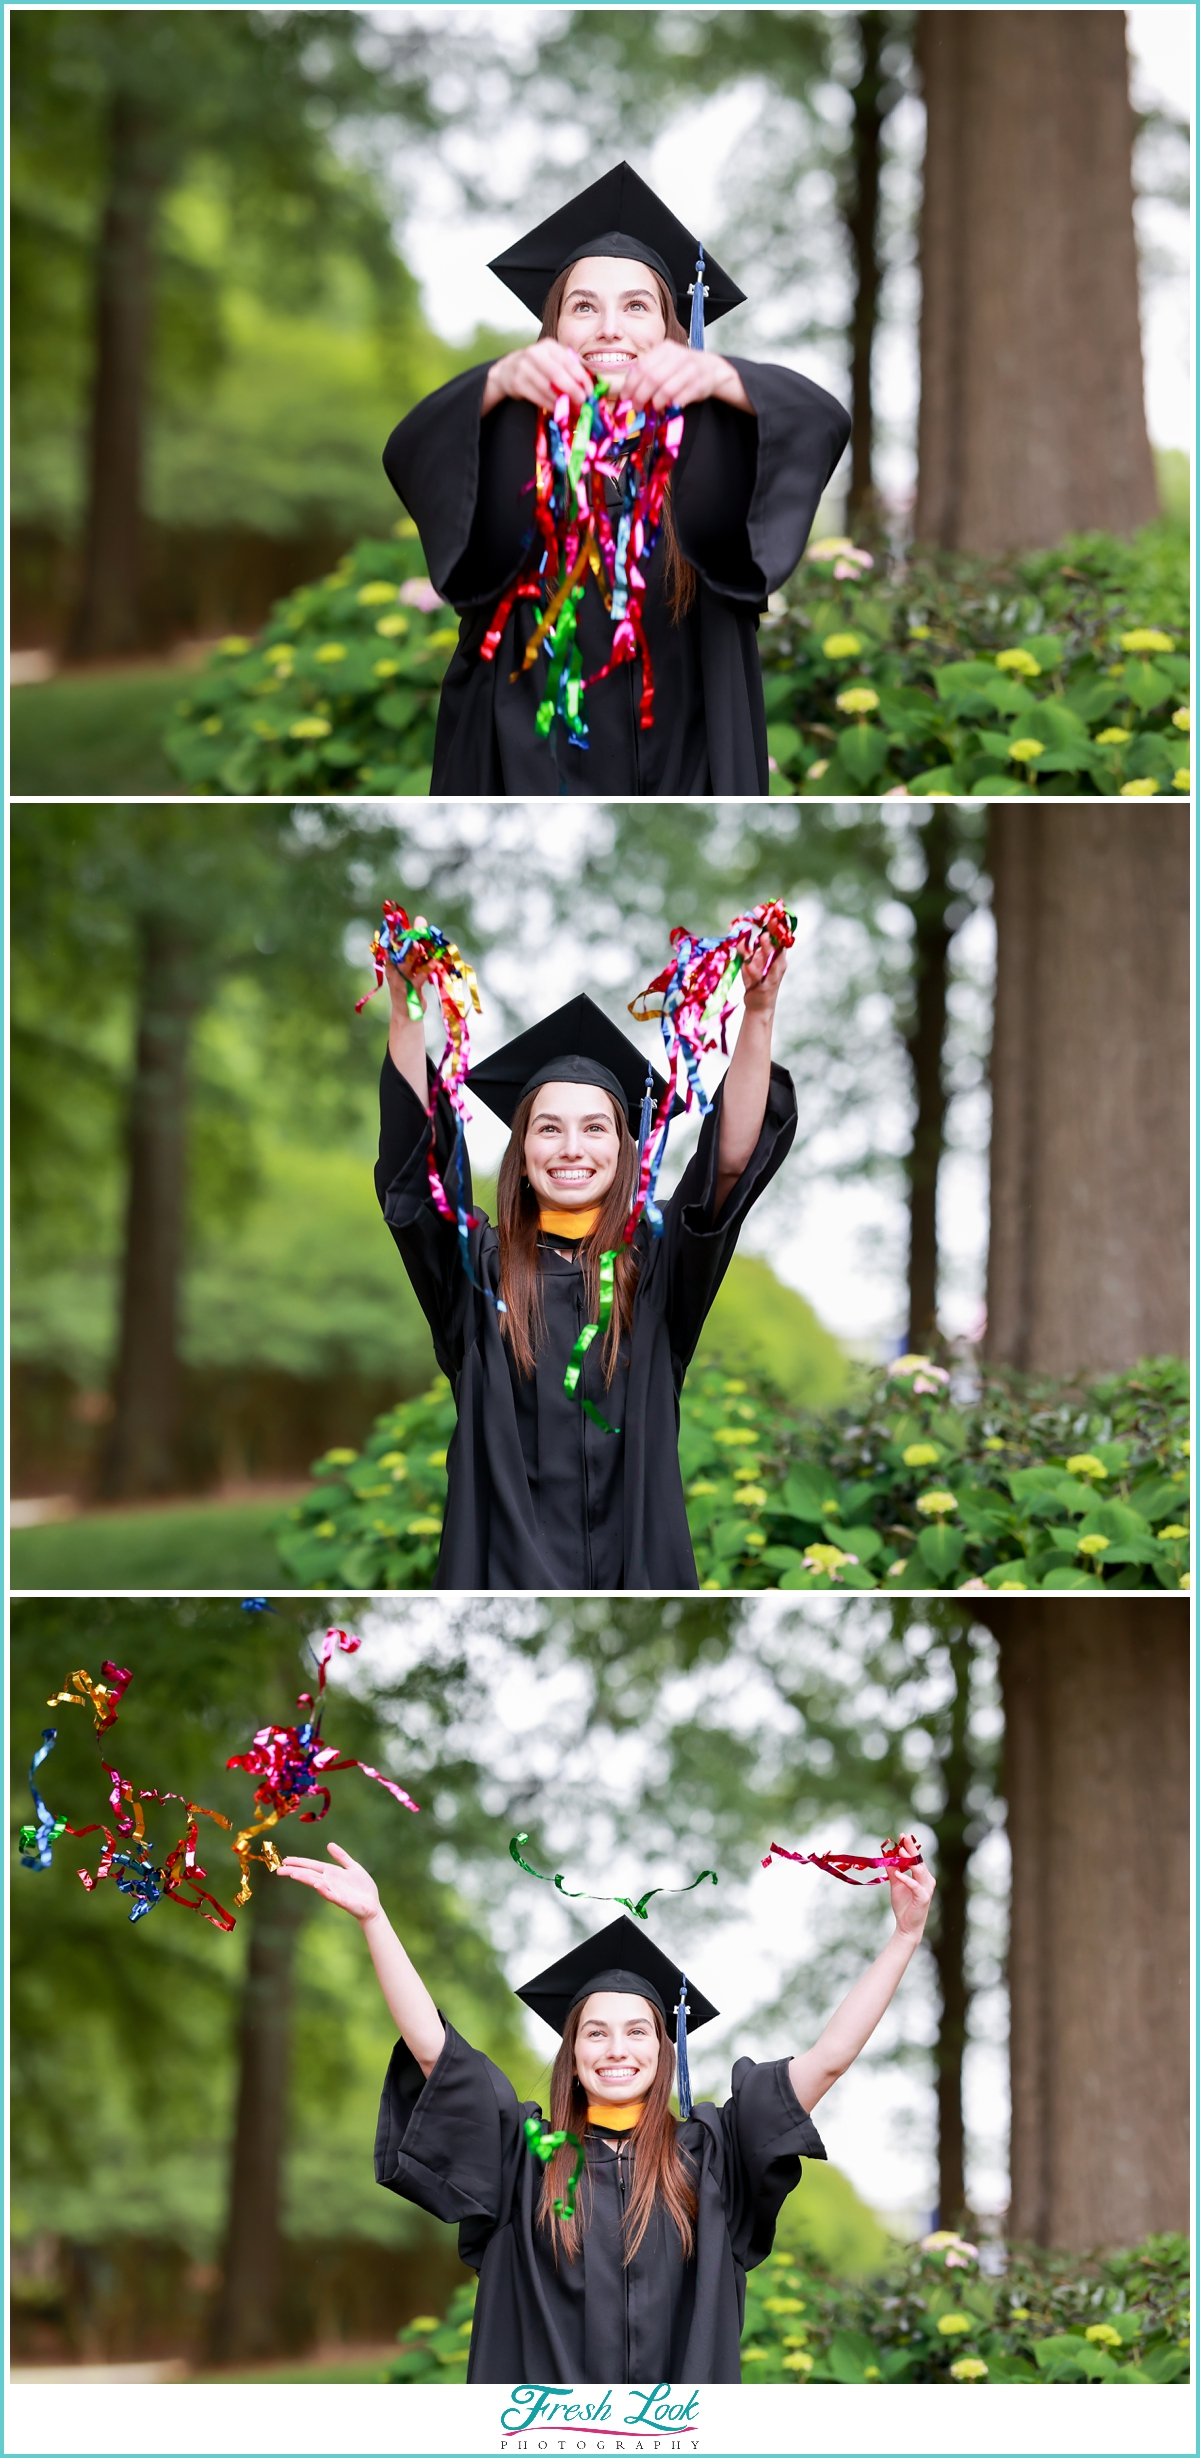 Streamers fun at graduation